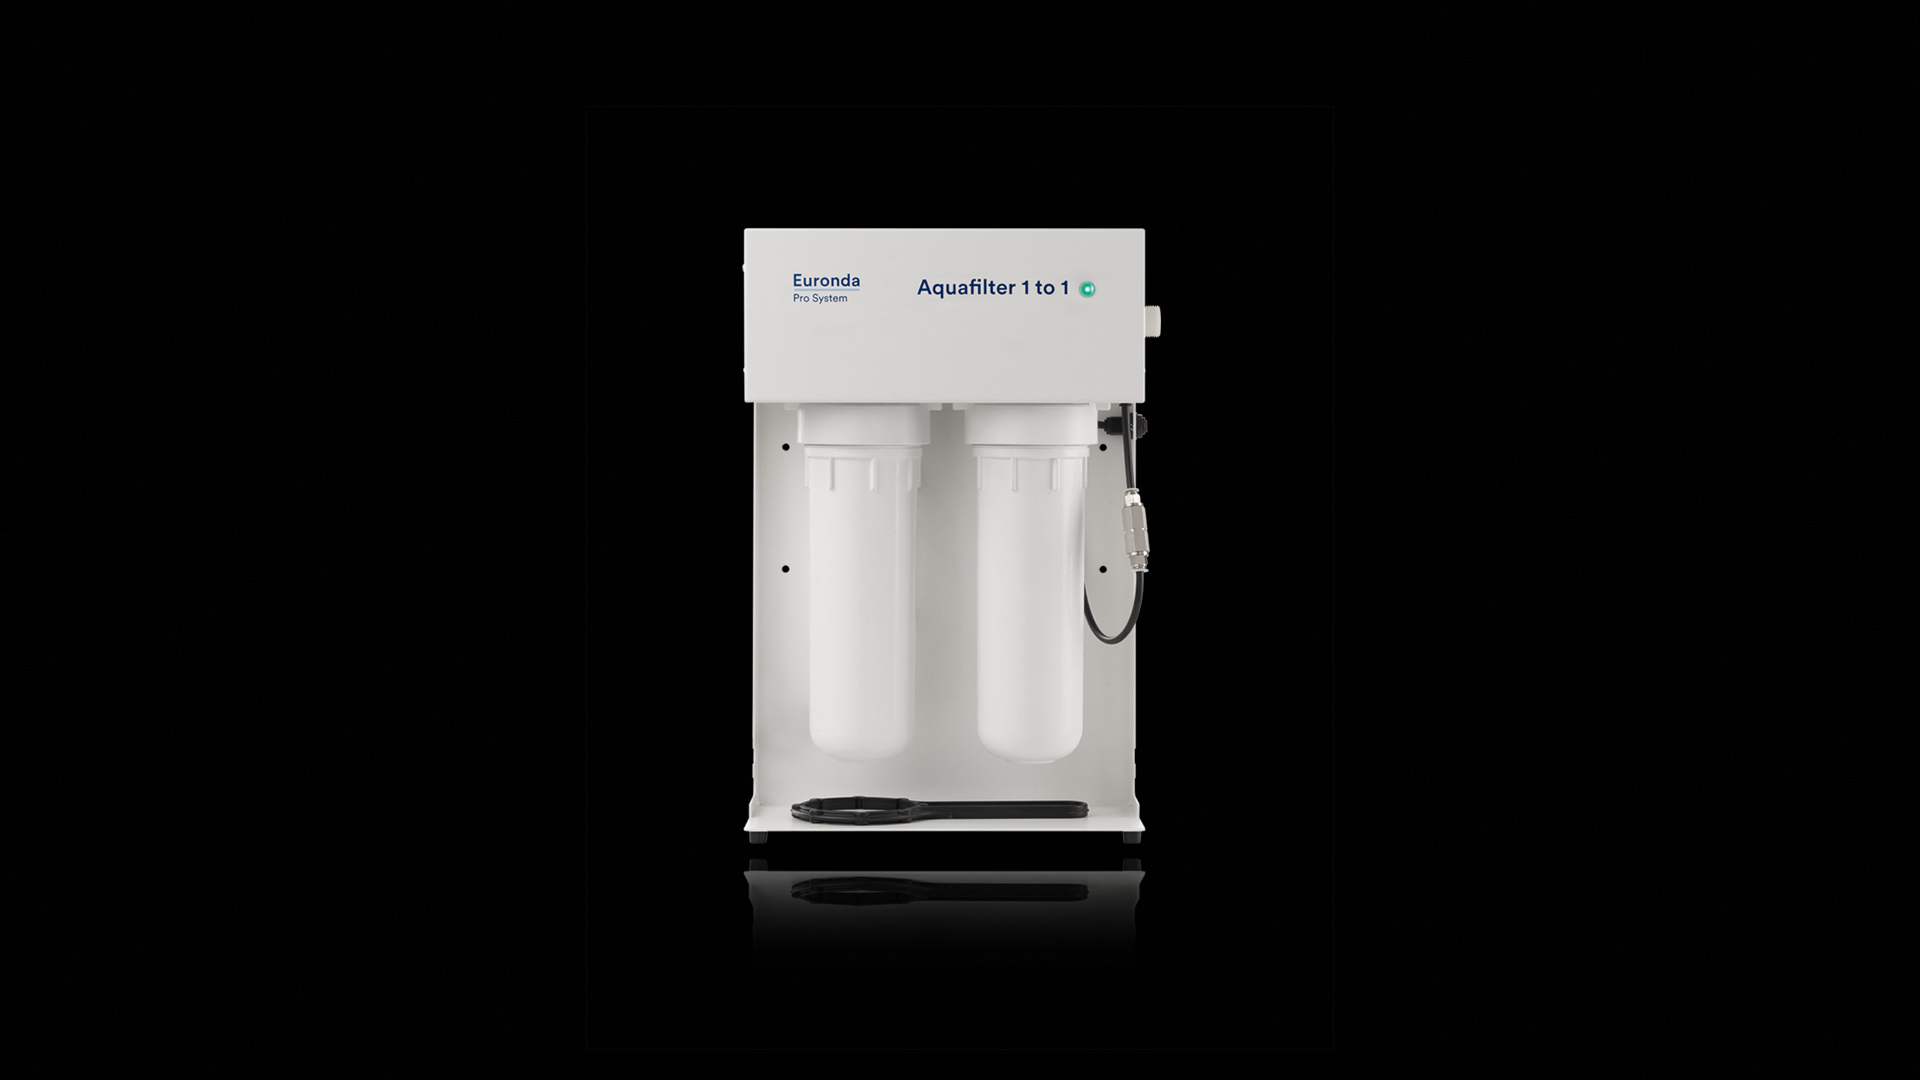 Aquafilter 1 to 1